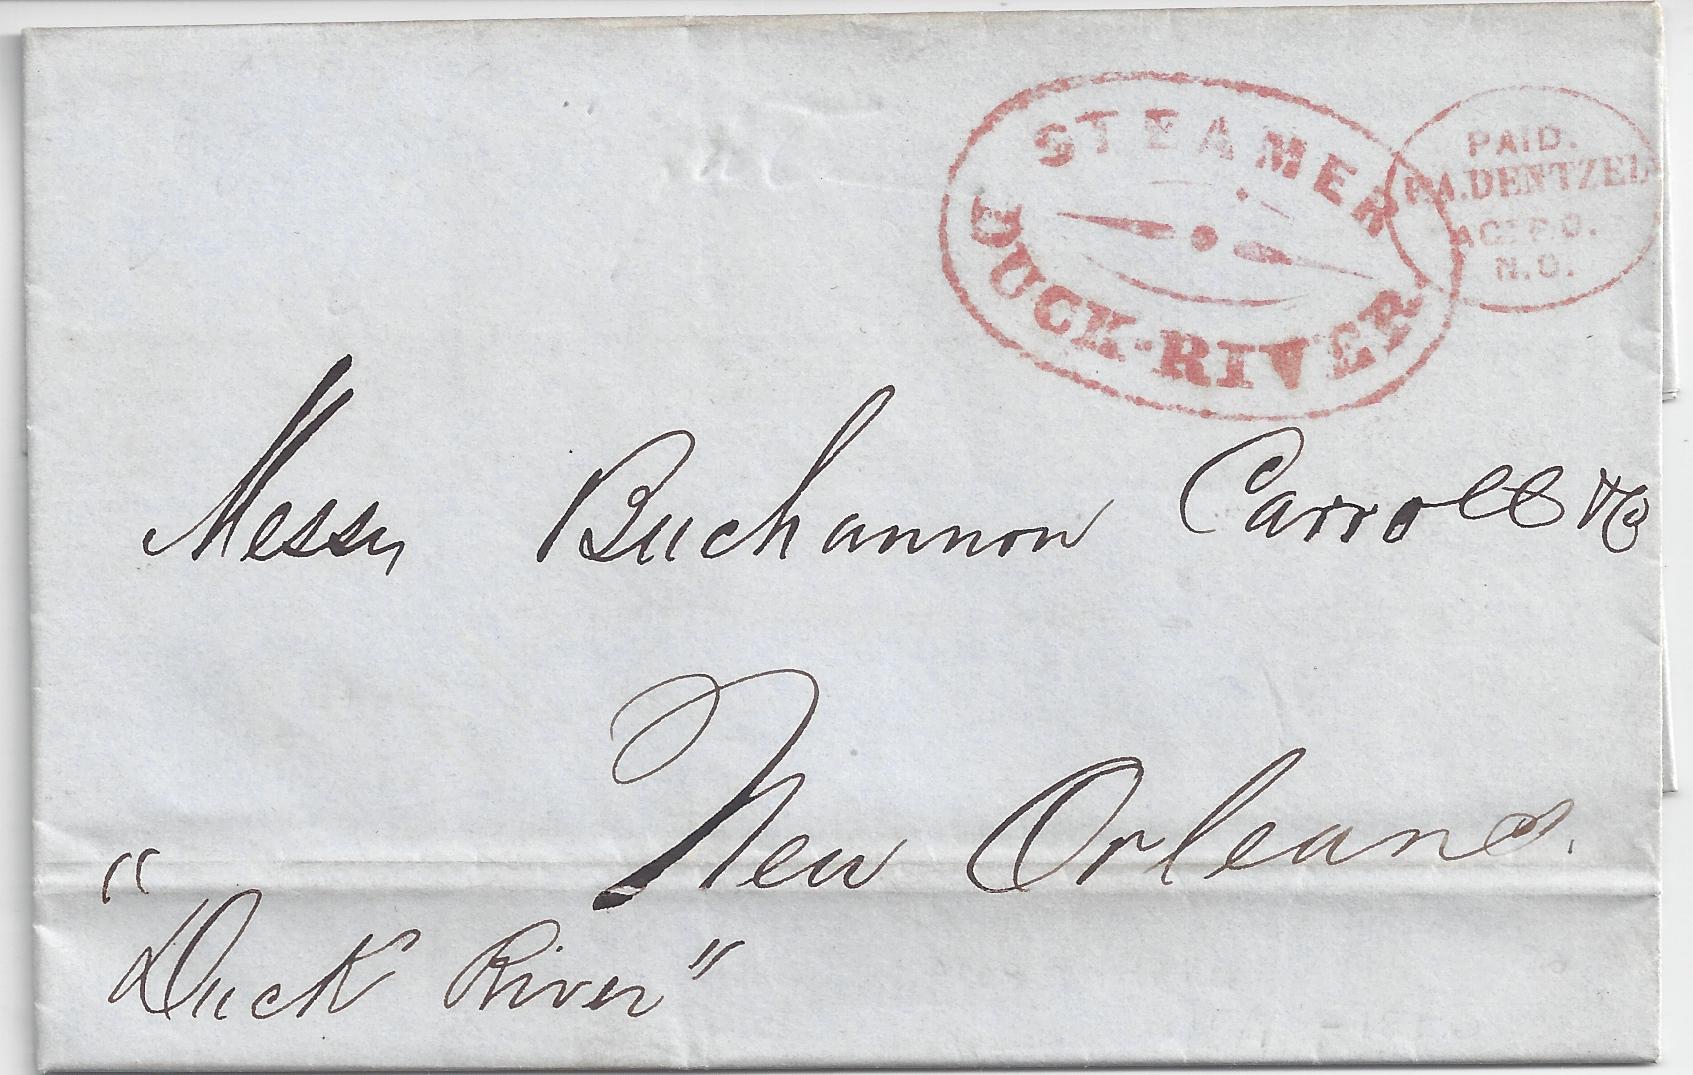 Frajola November 2012 Postal History Sale